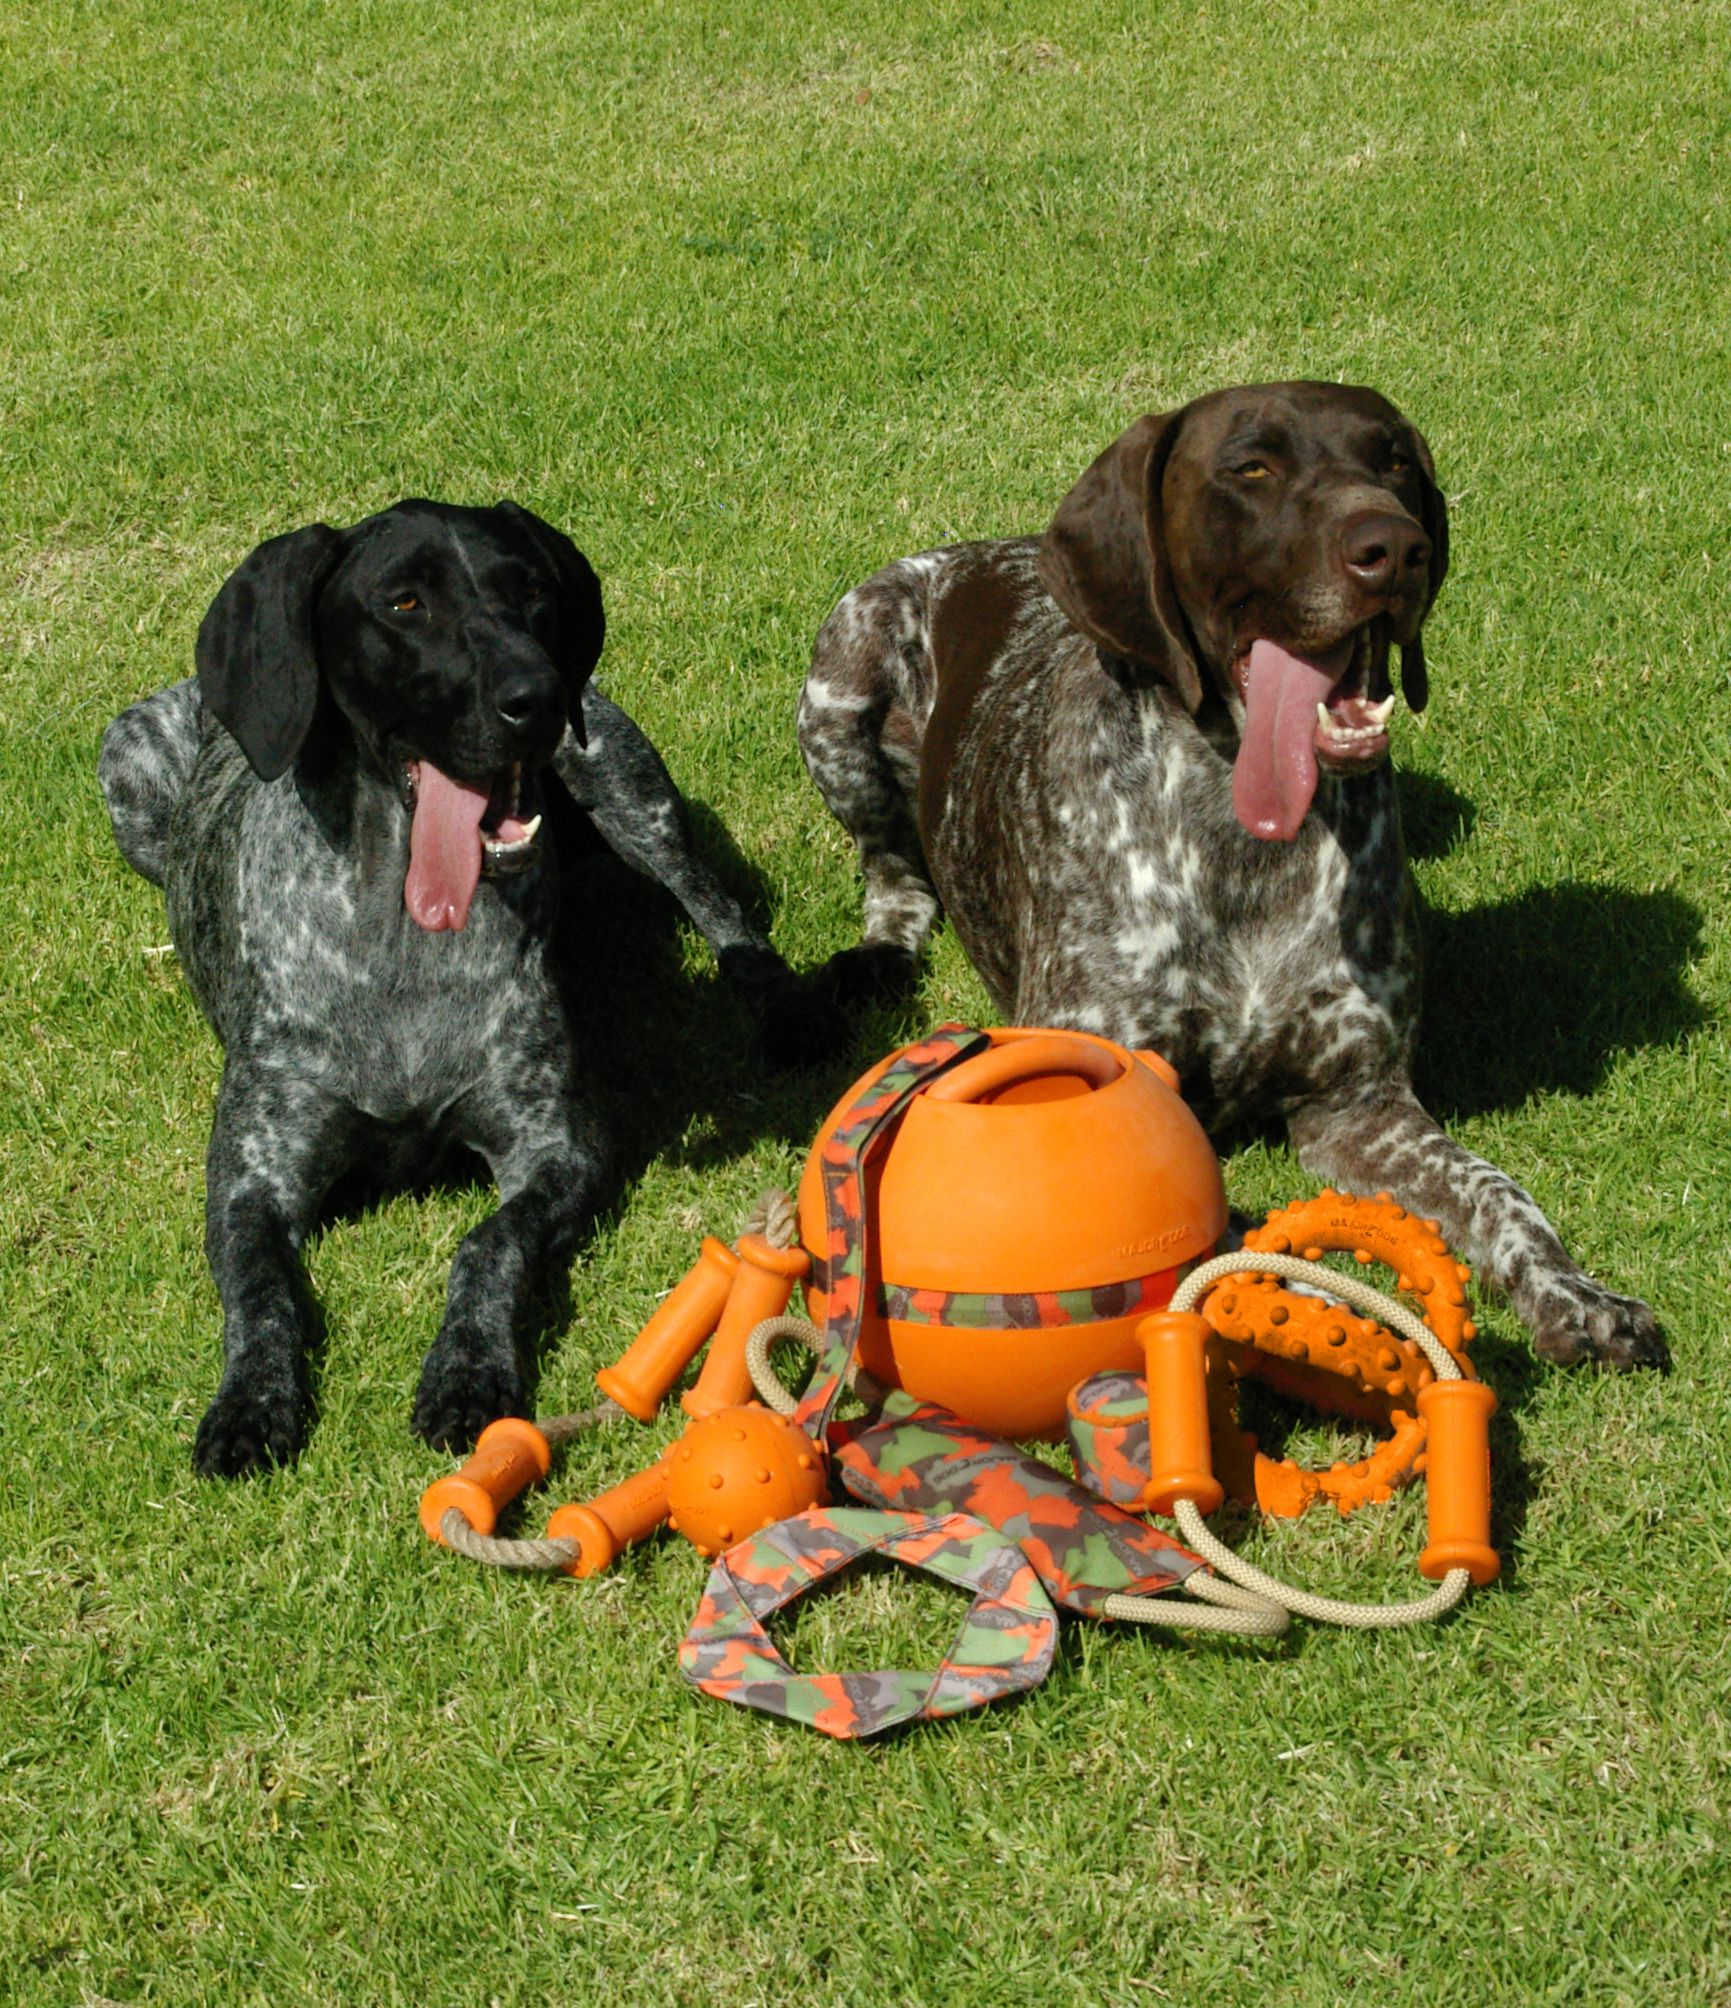 majordog GSP dogs dogtoys Aussie Dogs love Major Dog